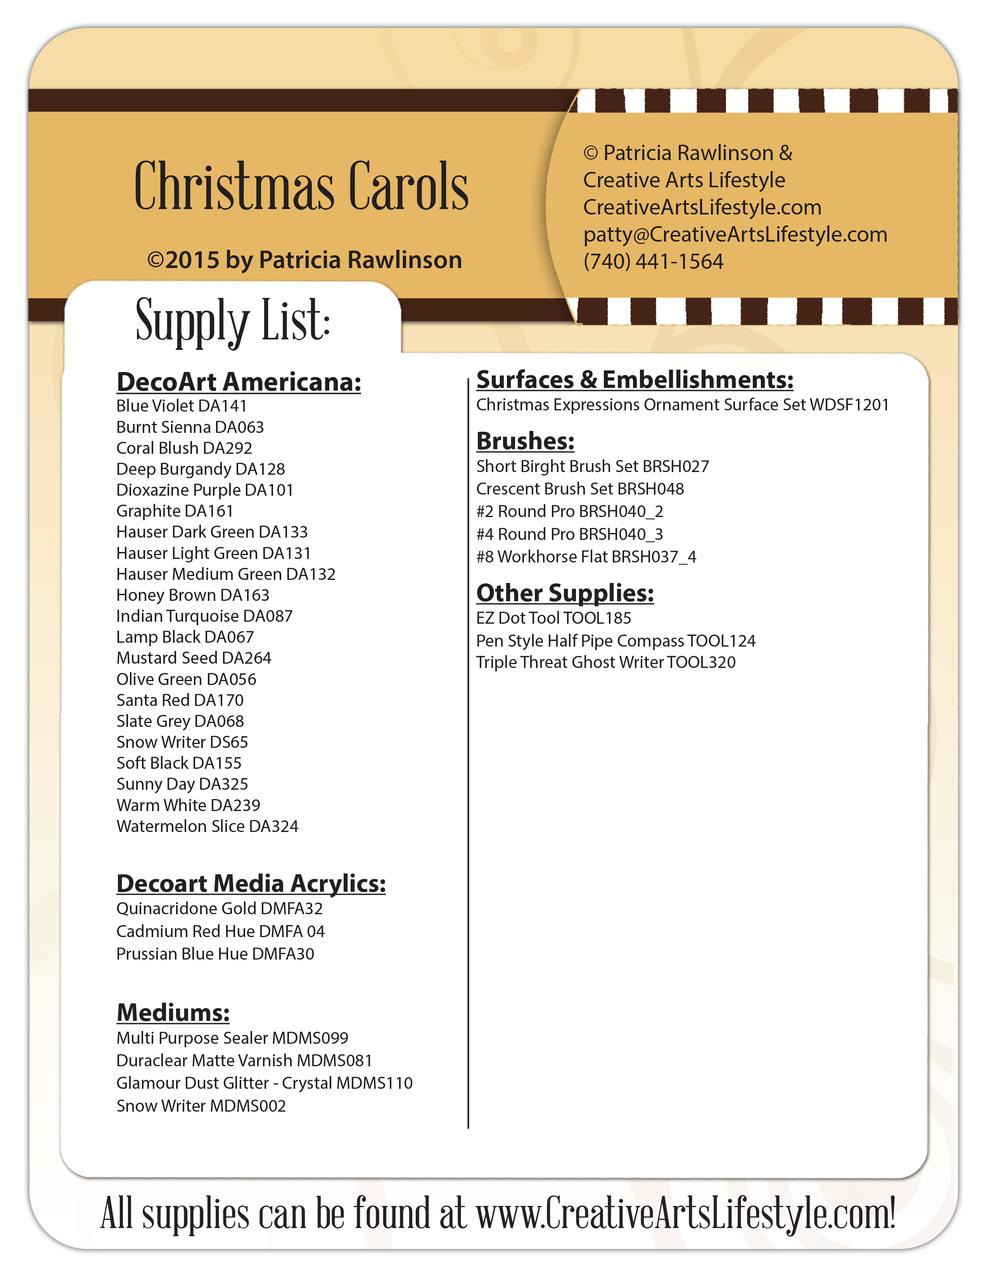 Christmas Carols Pattern Packet - Patricia Rawlinson